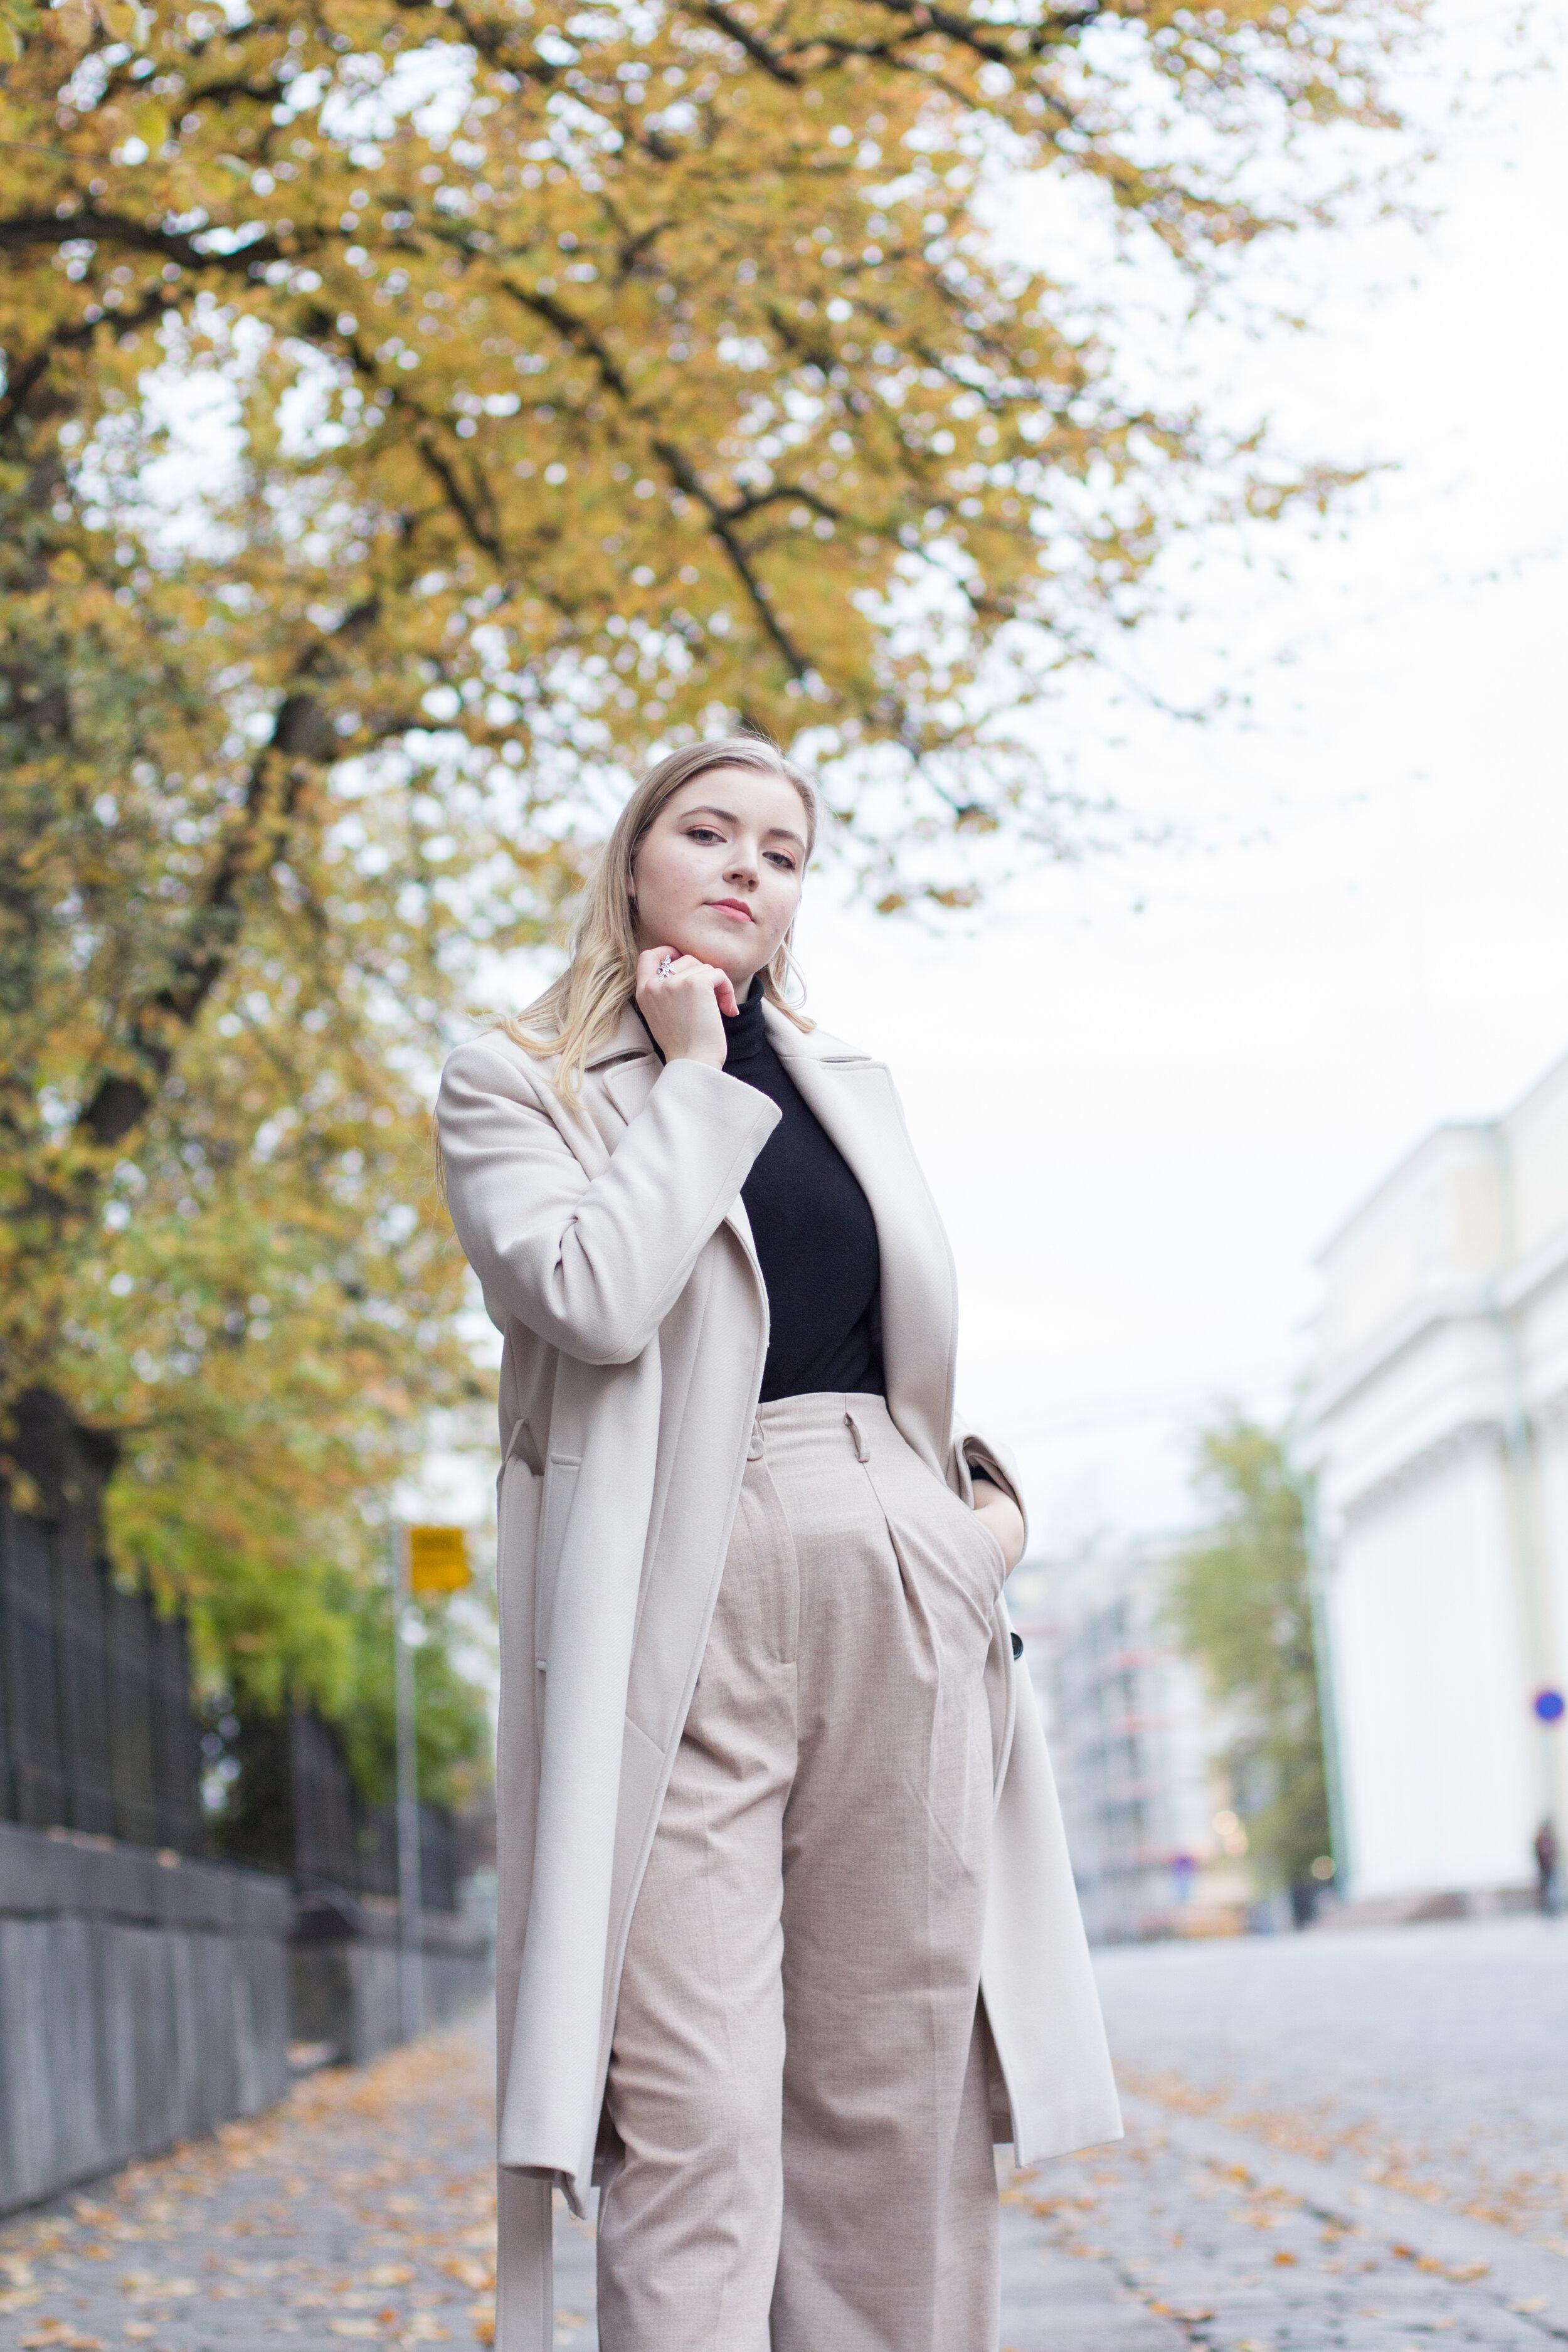 Beige coat outfit girl photo 7.jpg